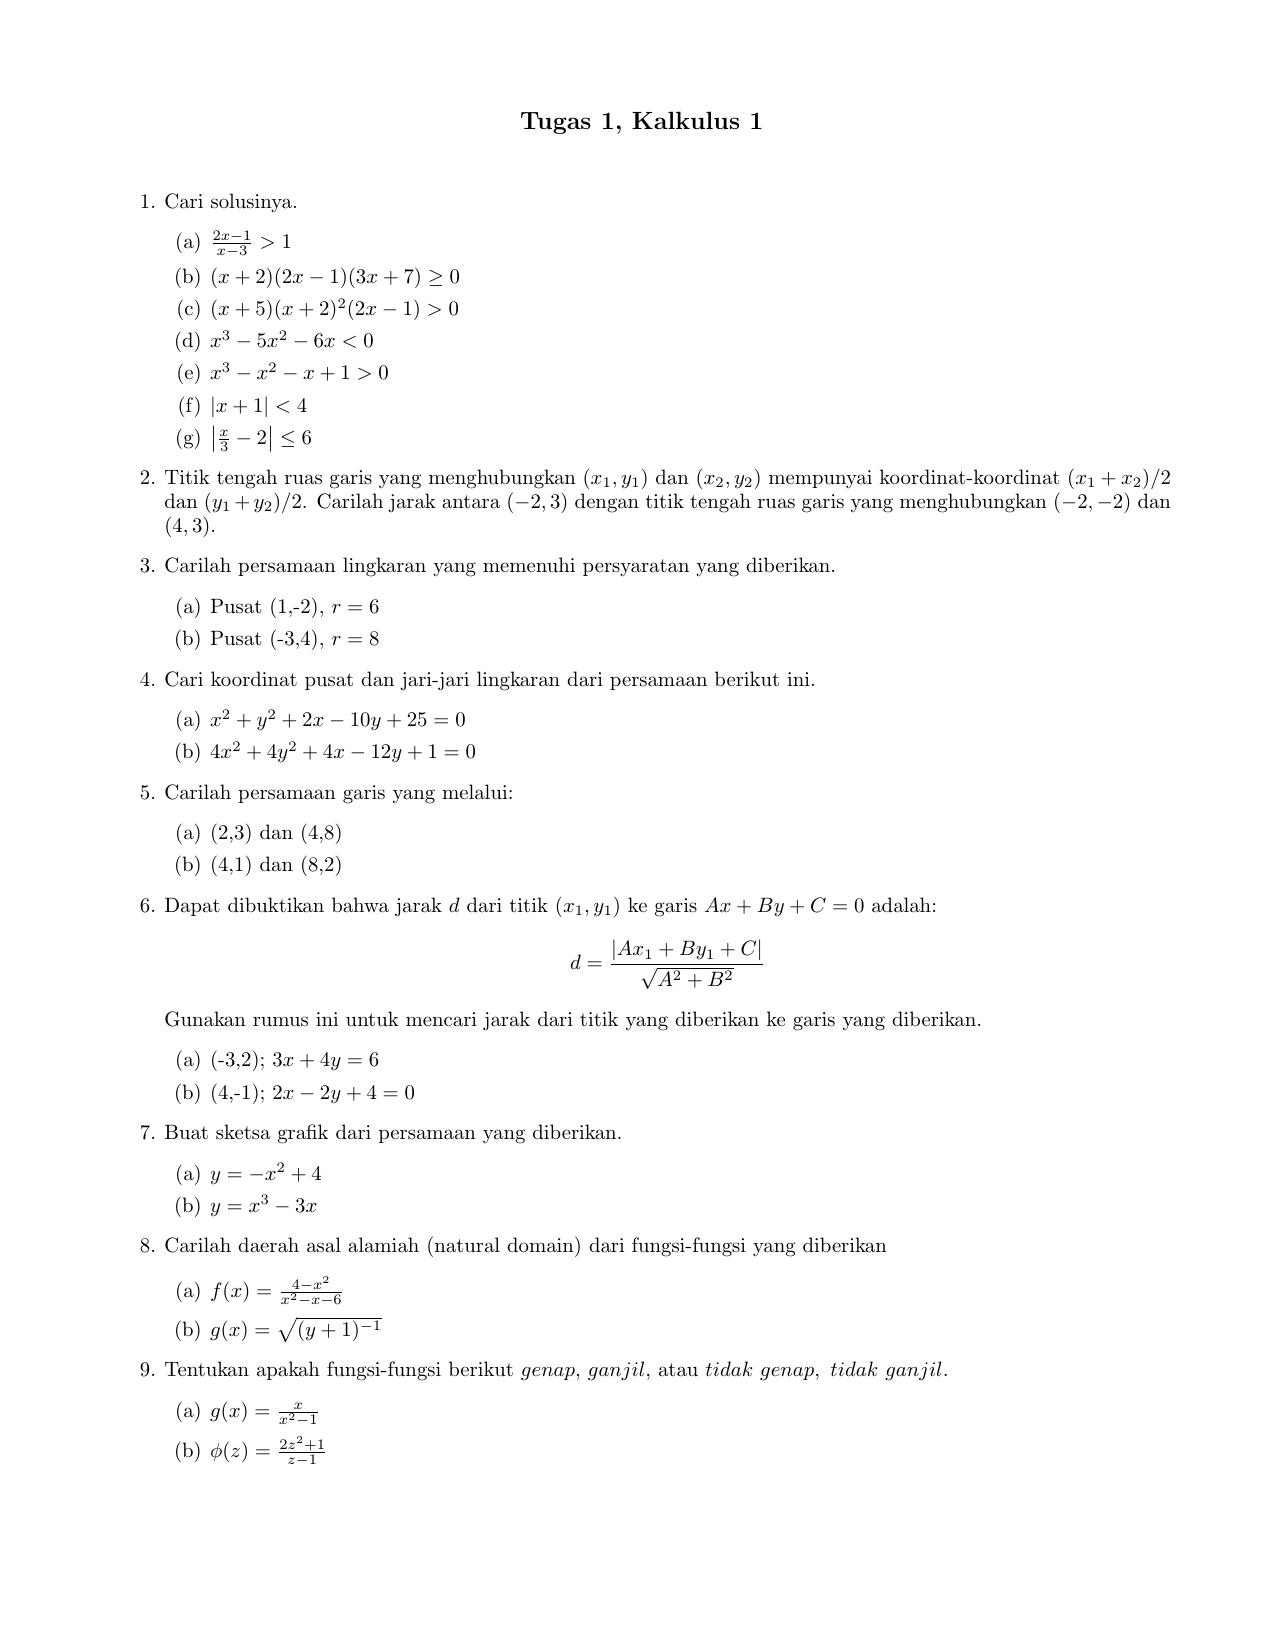 Tugas 1 Kalkulus 1